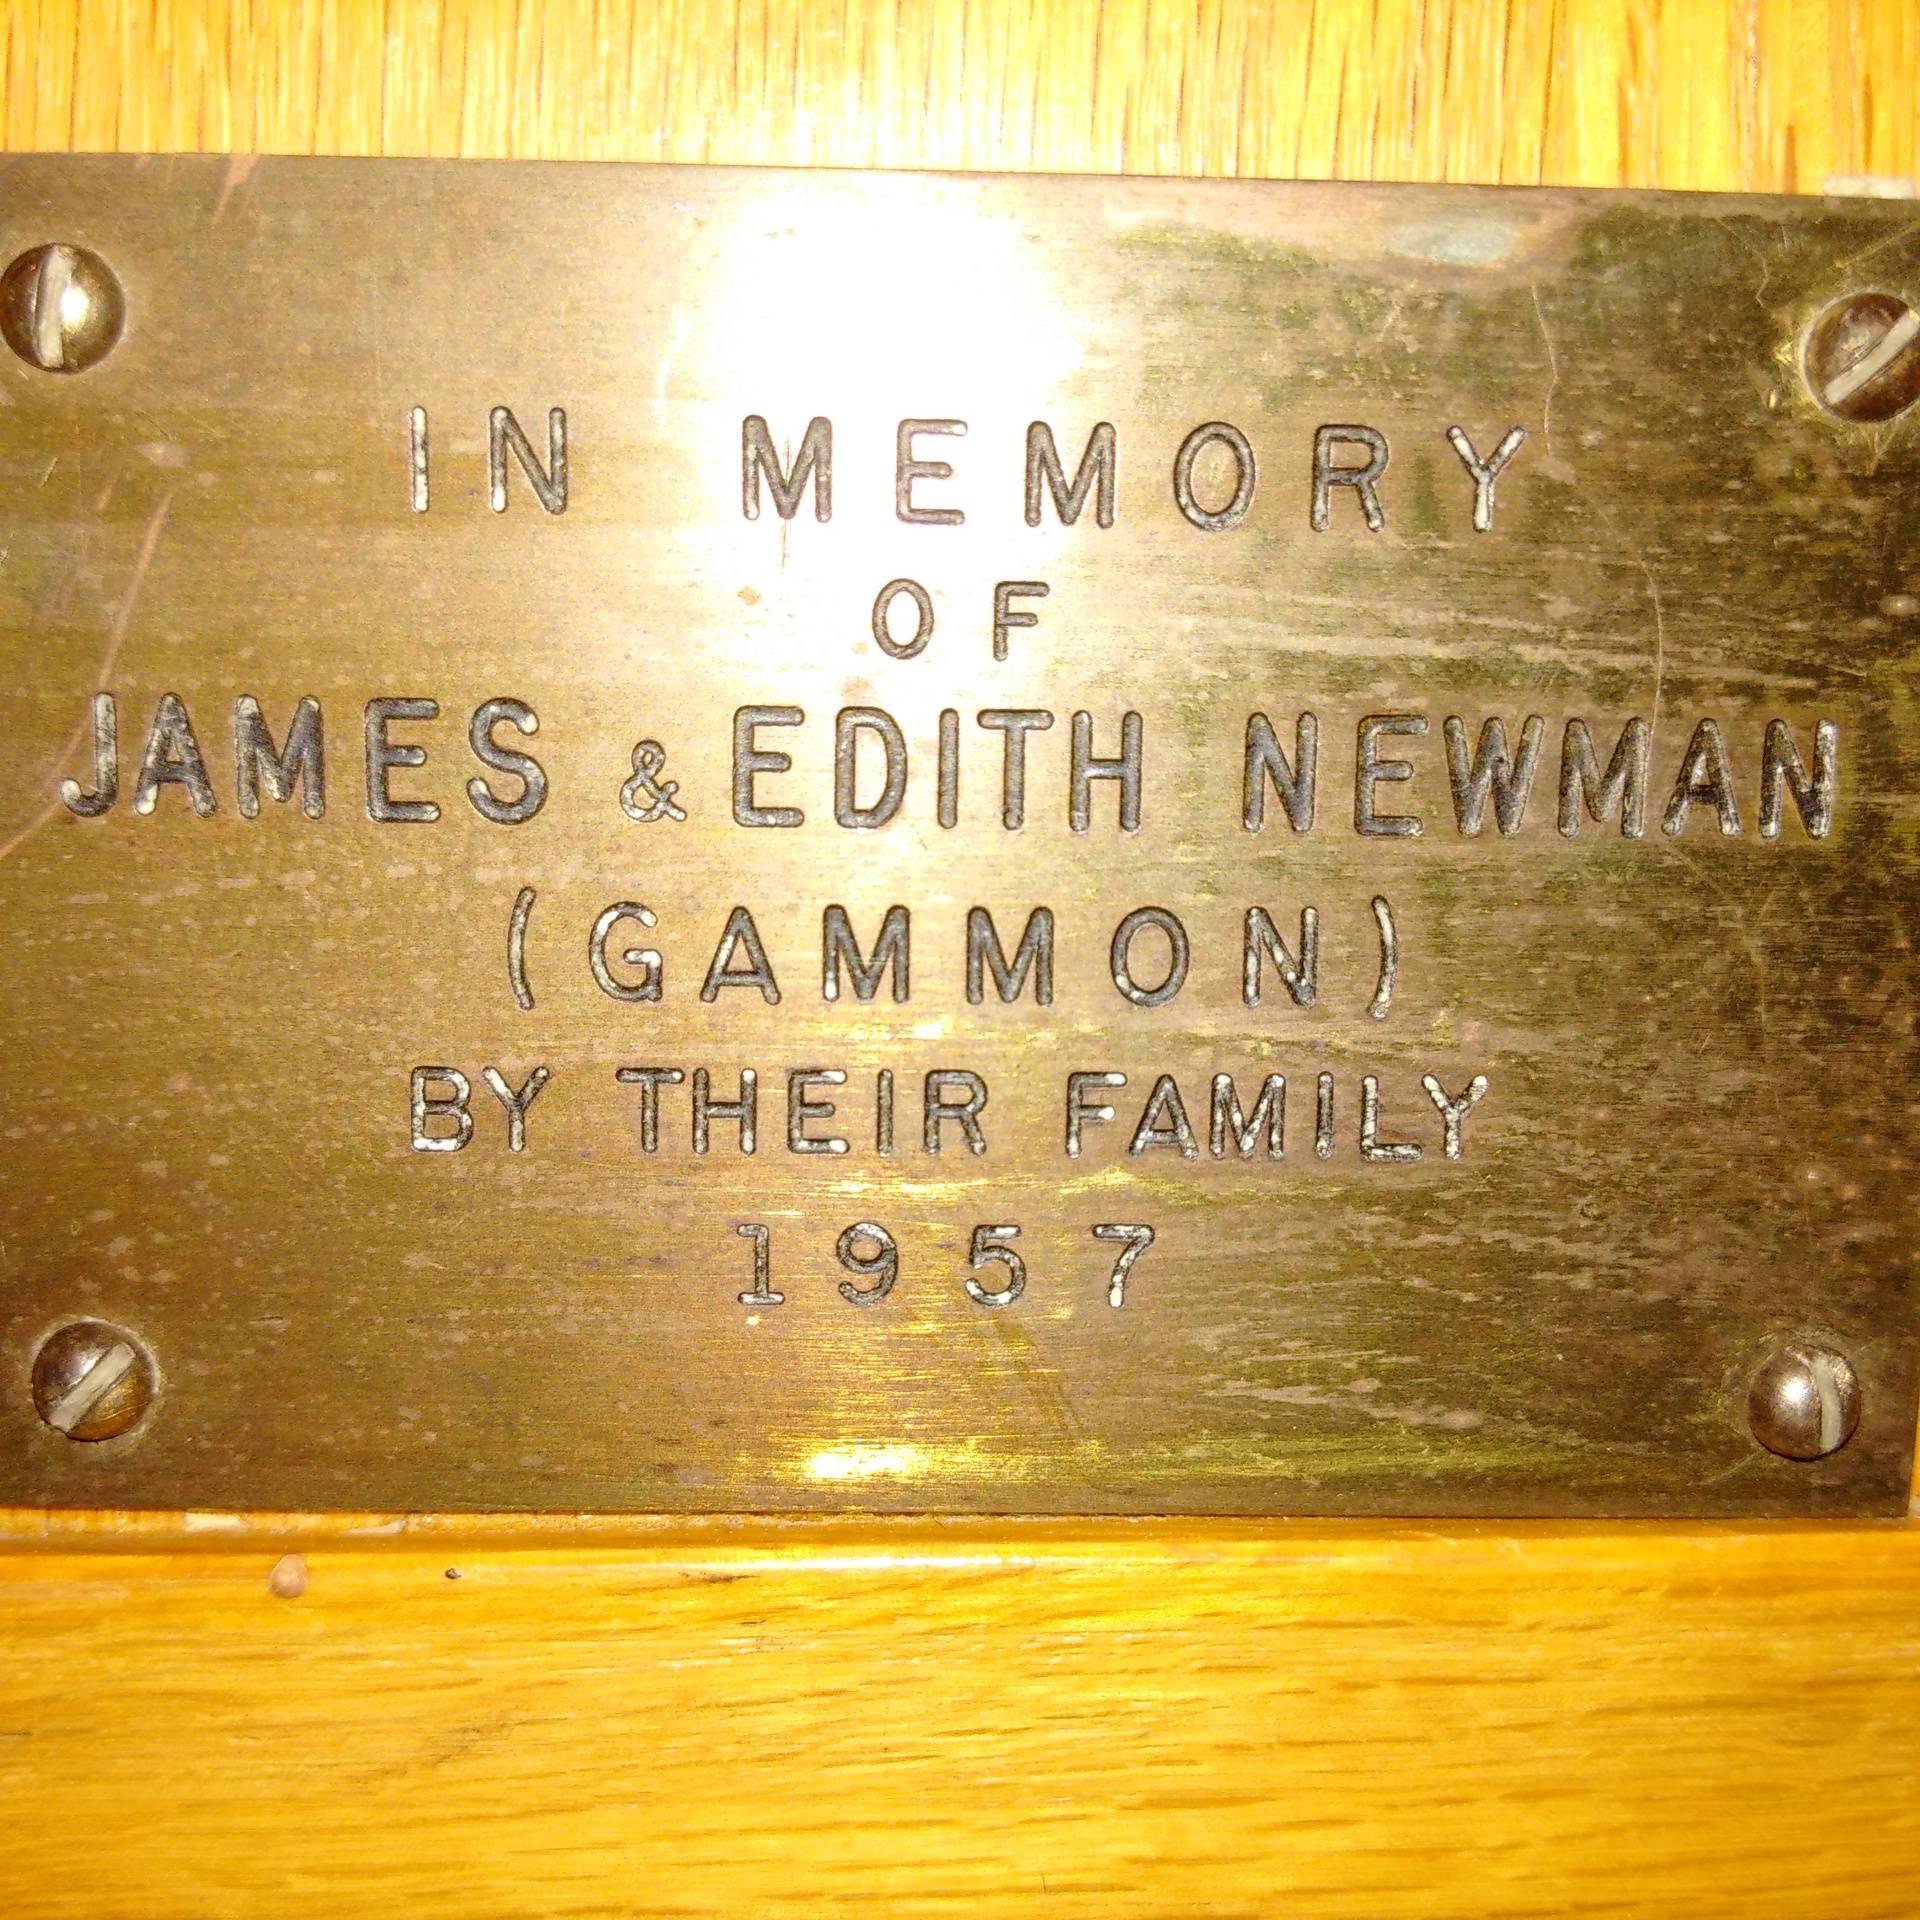 James and Edith Newman 1957